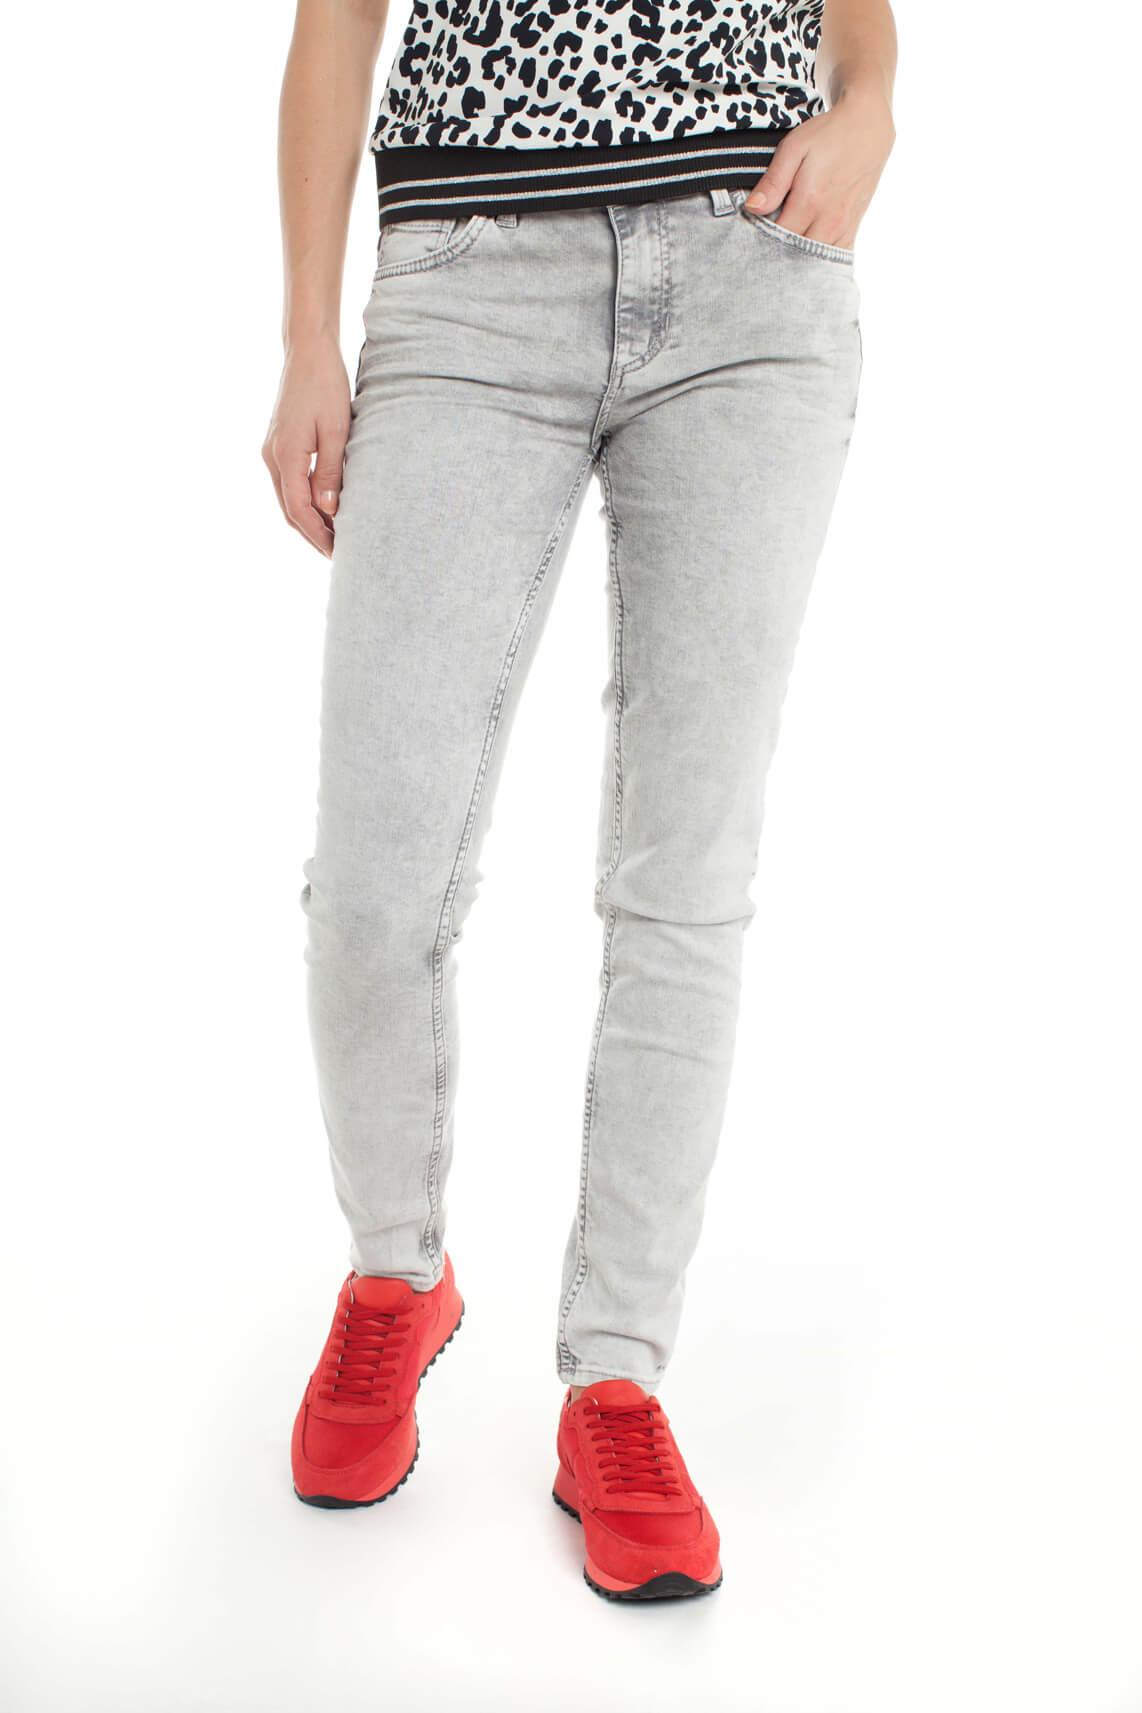 Rosner Dames Antonia garment dye jeans Grijs